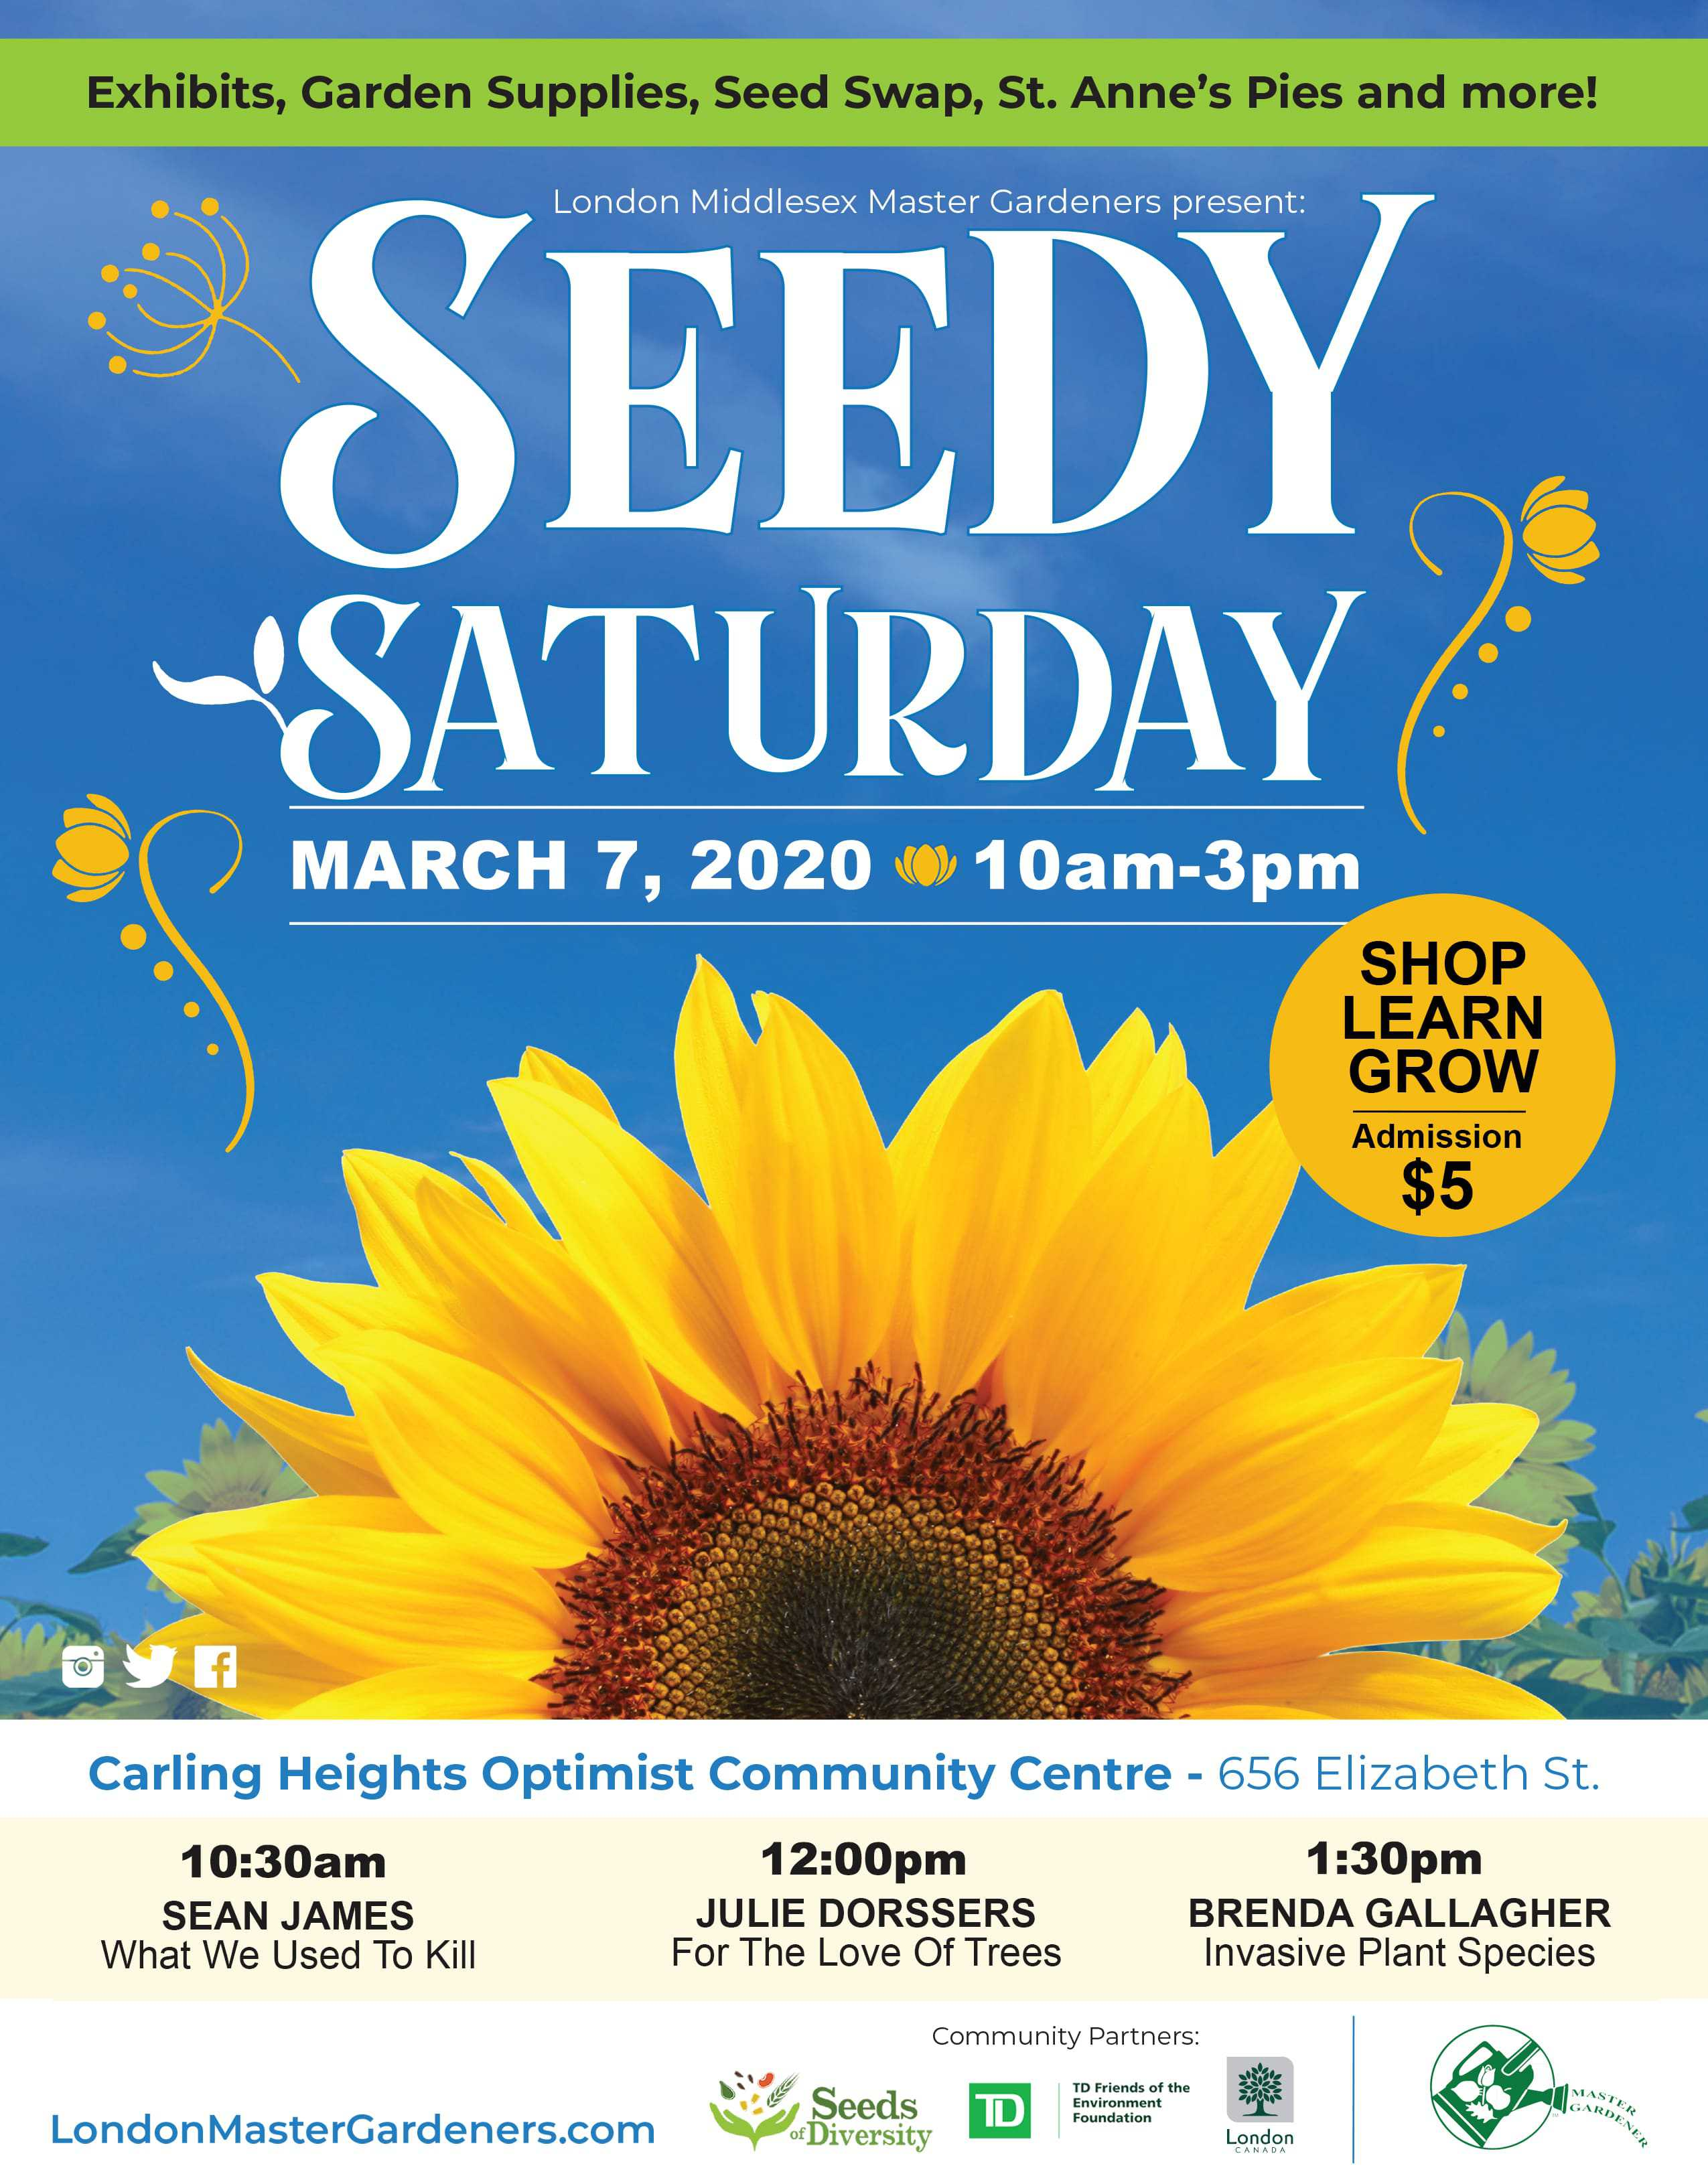 Seedy Saturday in London